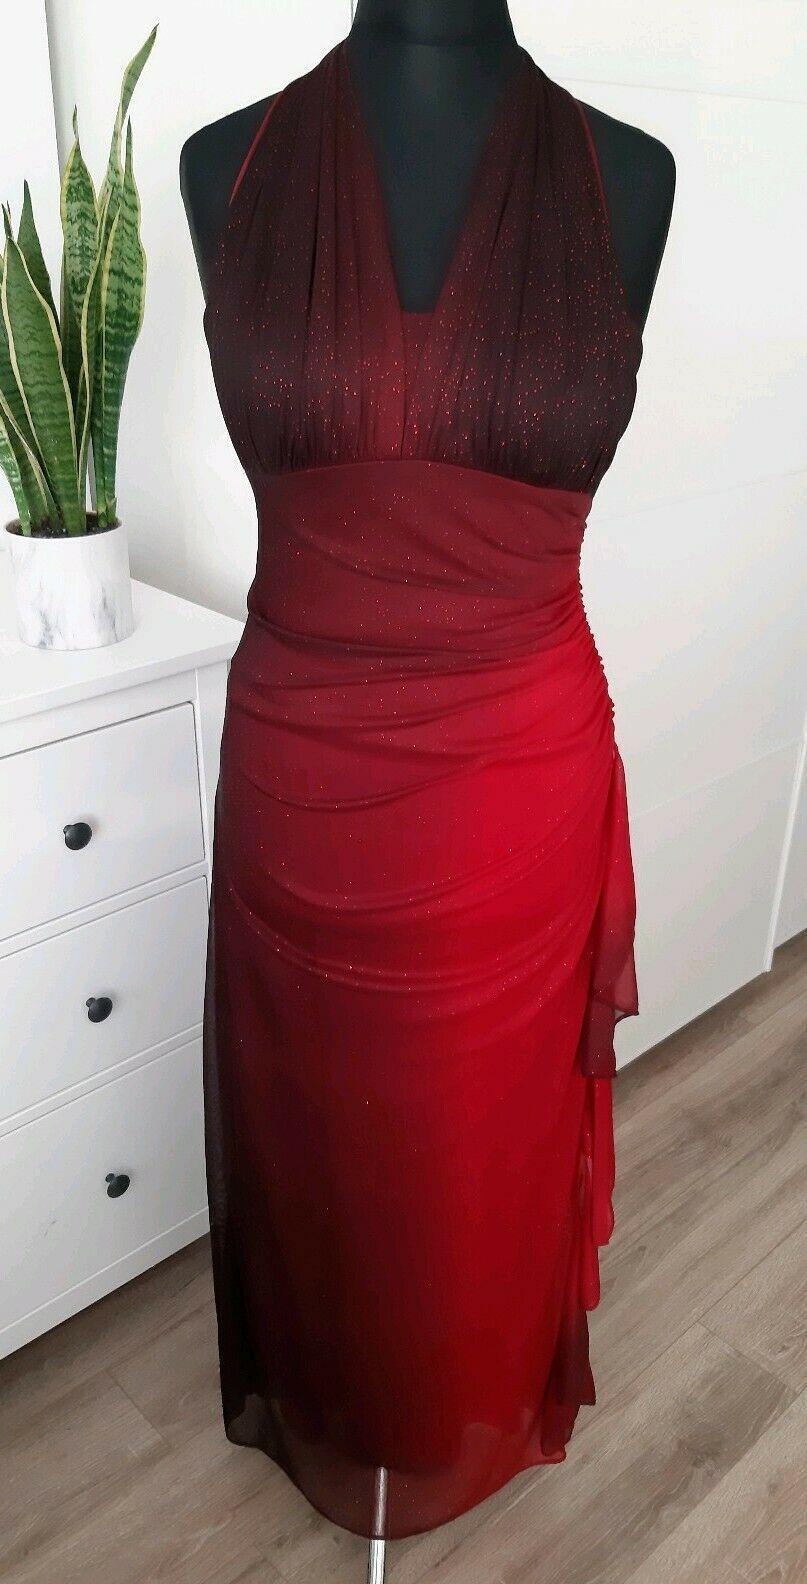 Atemberaubendes Kleid in Rot Gr. 20 (M) – Gr. 20 (L) Schimmer